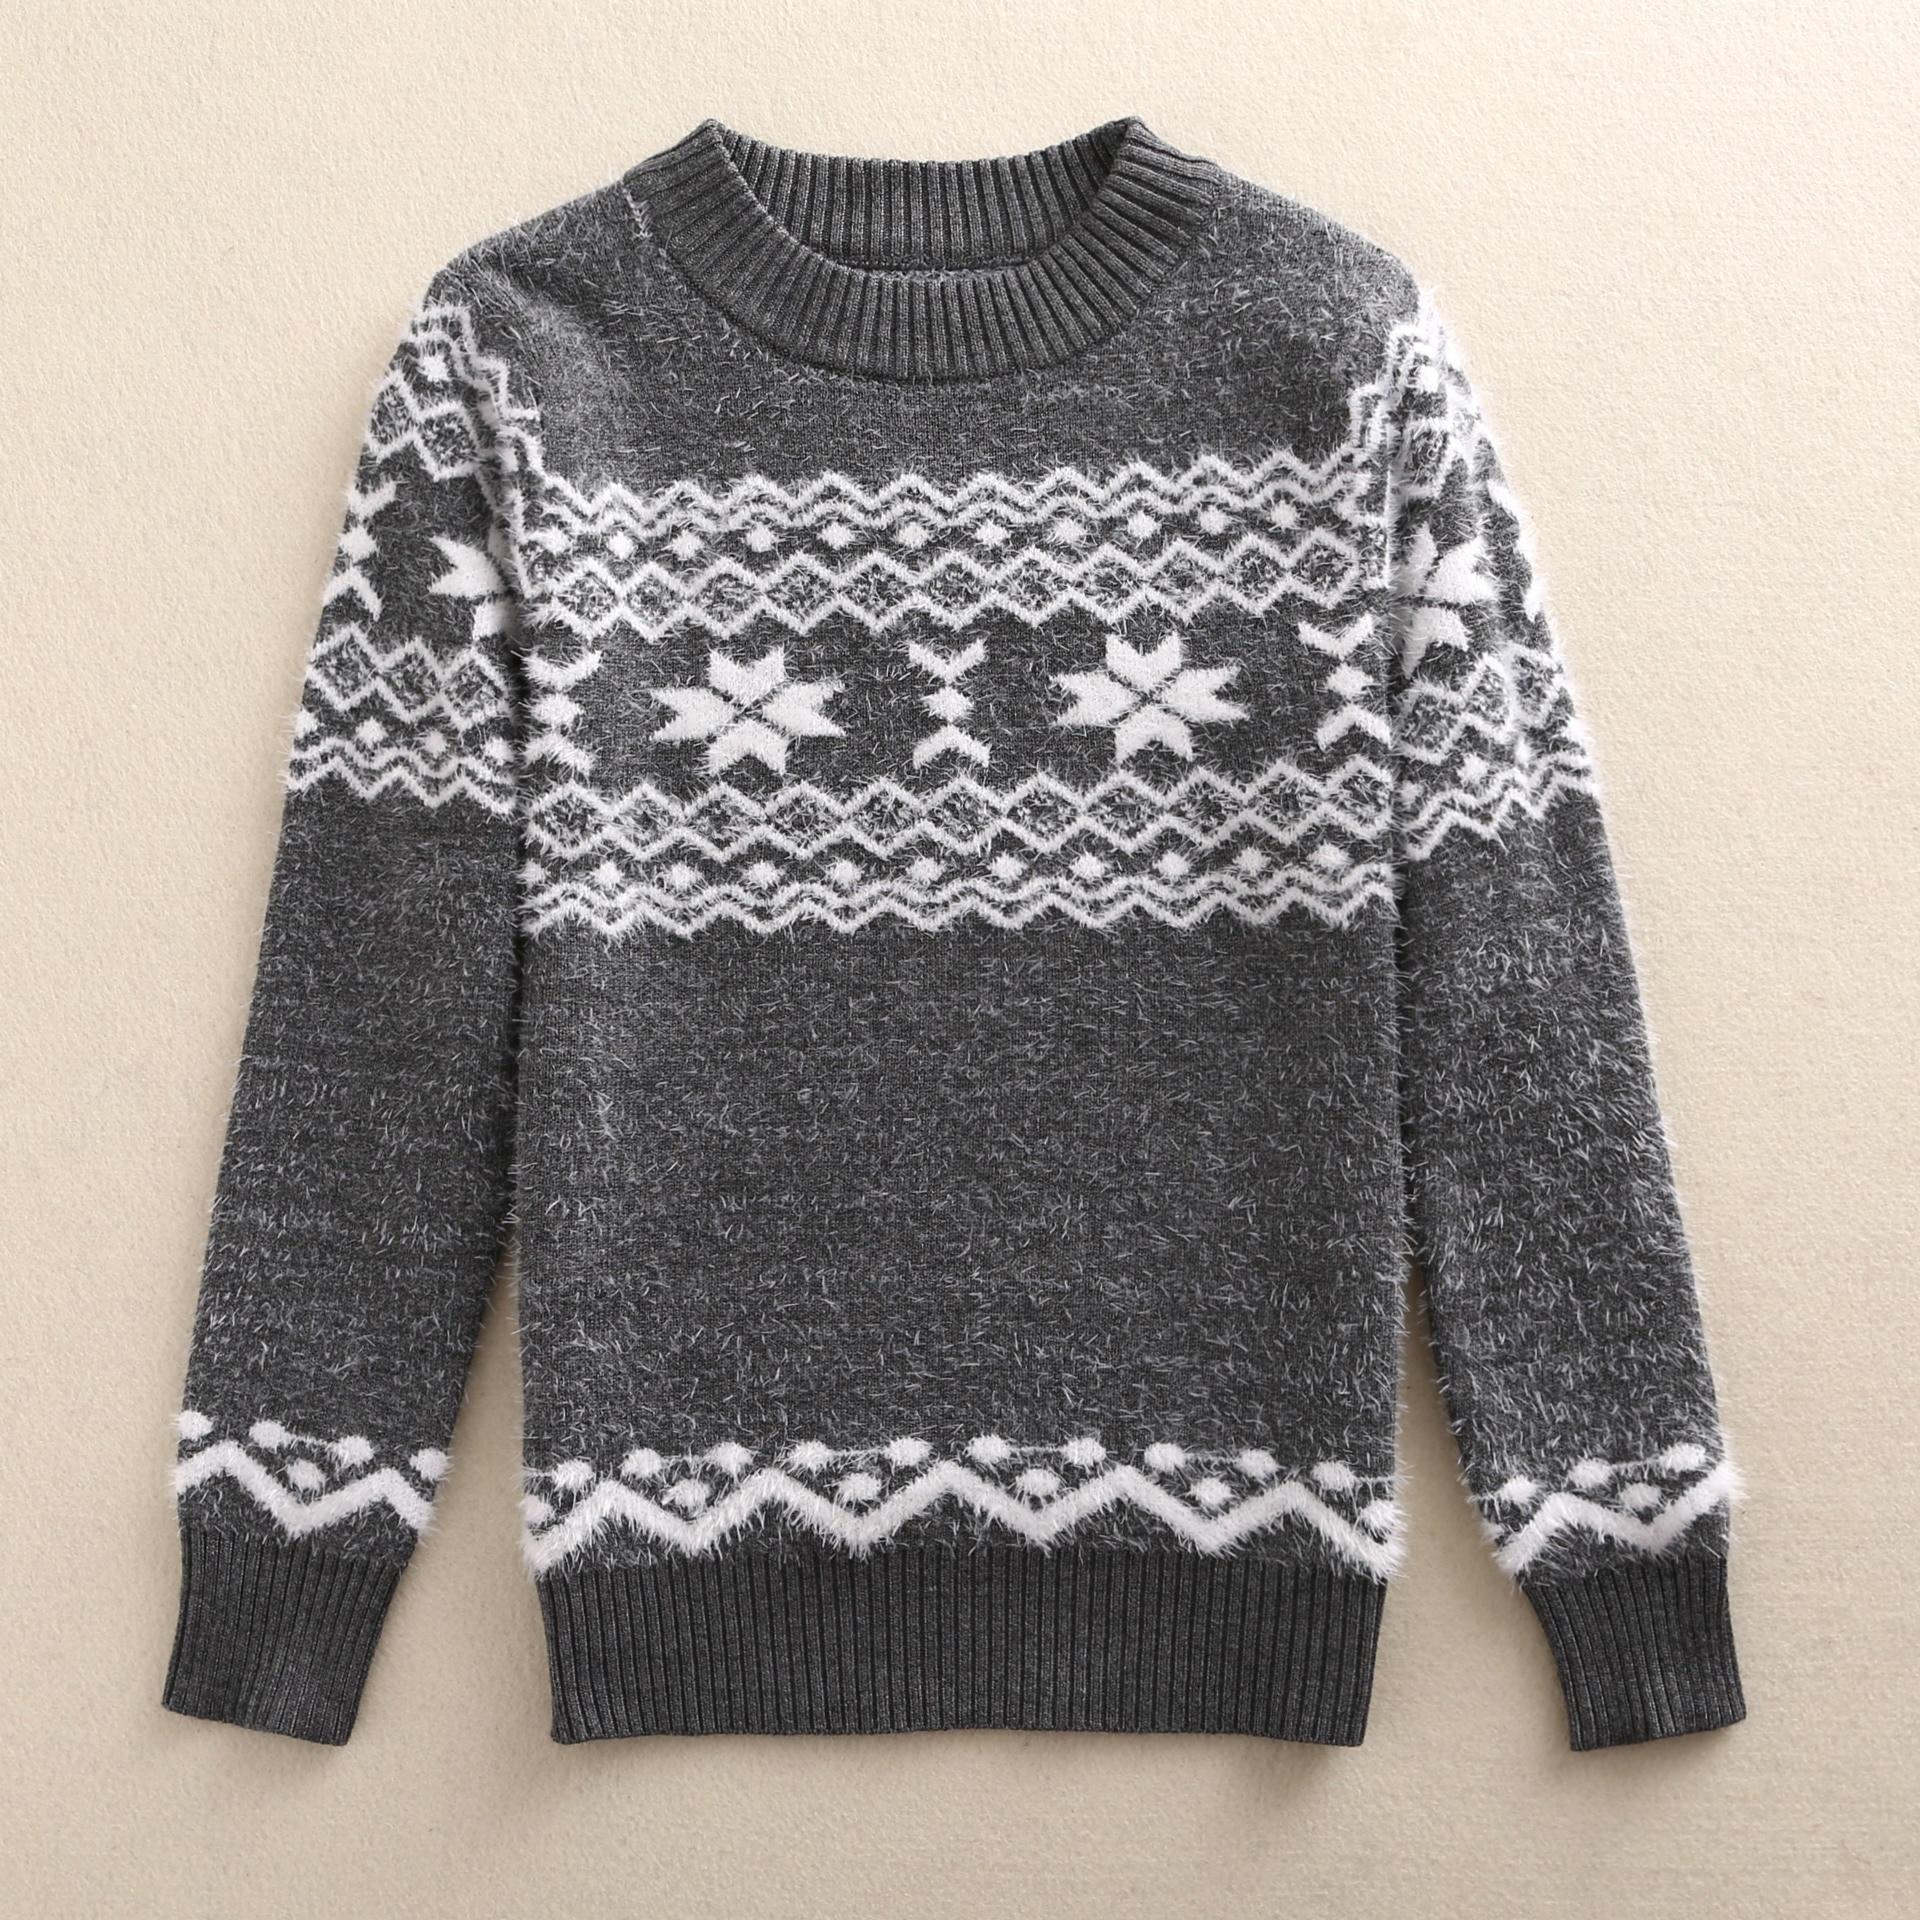 3882e98982 Boys Knit Vest Sweater Winter Casual Boys Cardigan Children Kids Wool  Sweaters Pattern Baby Sweater Boys Clothing Tops